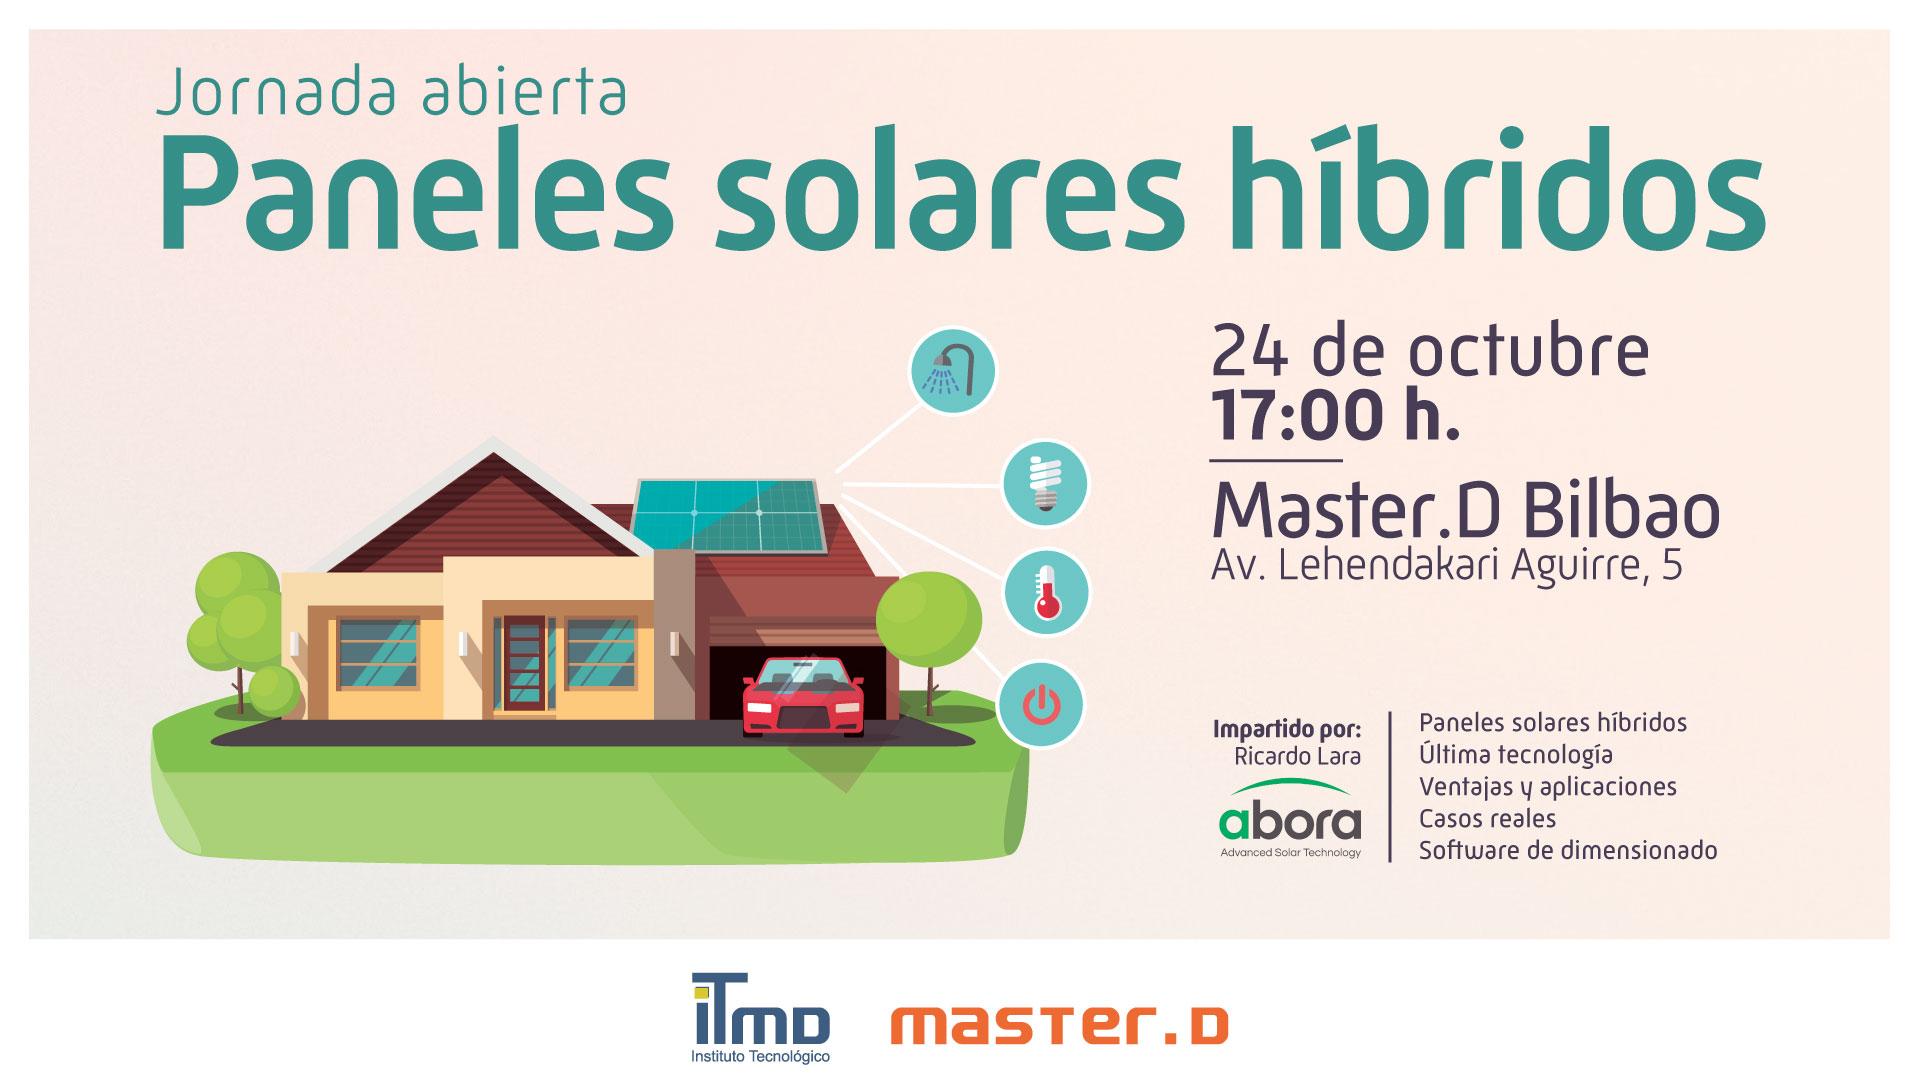 Jornada sobre paneles solares híbridos en Bilbao